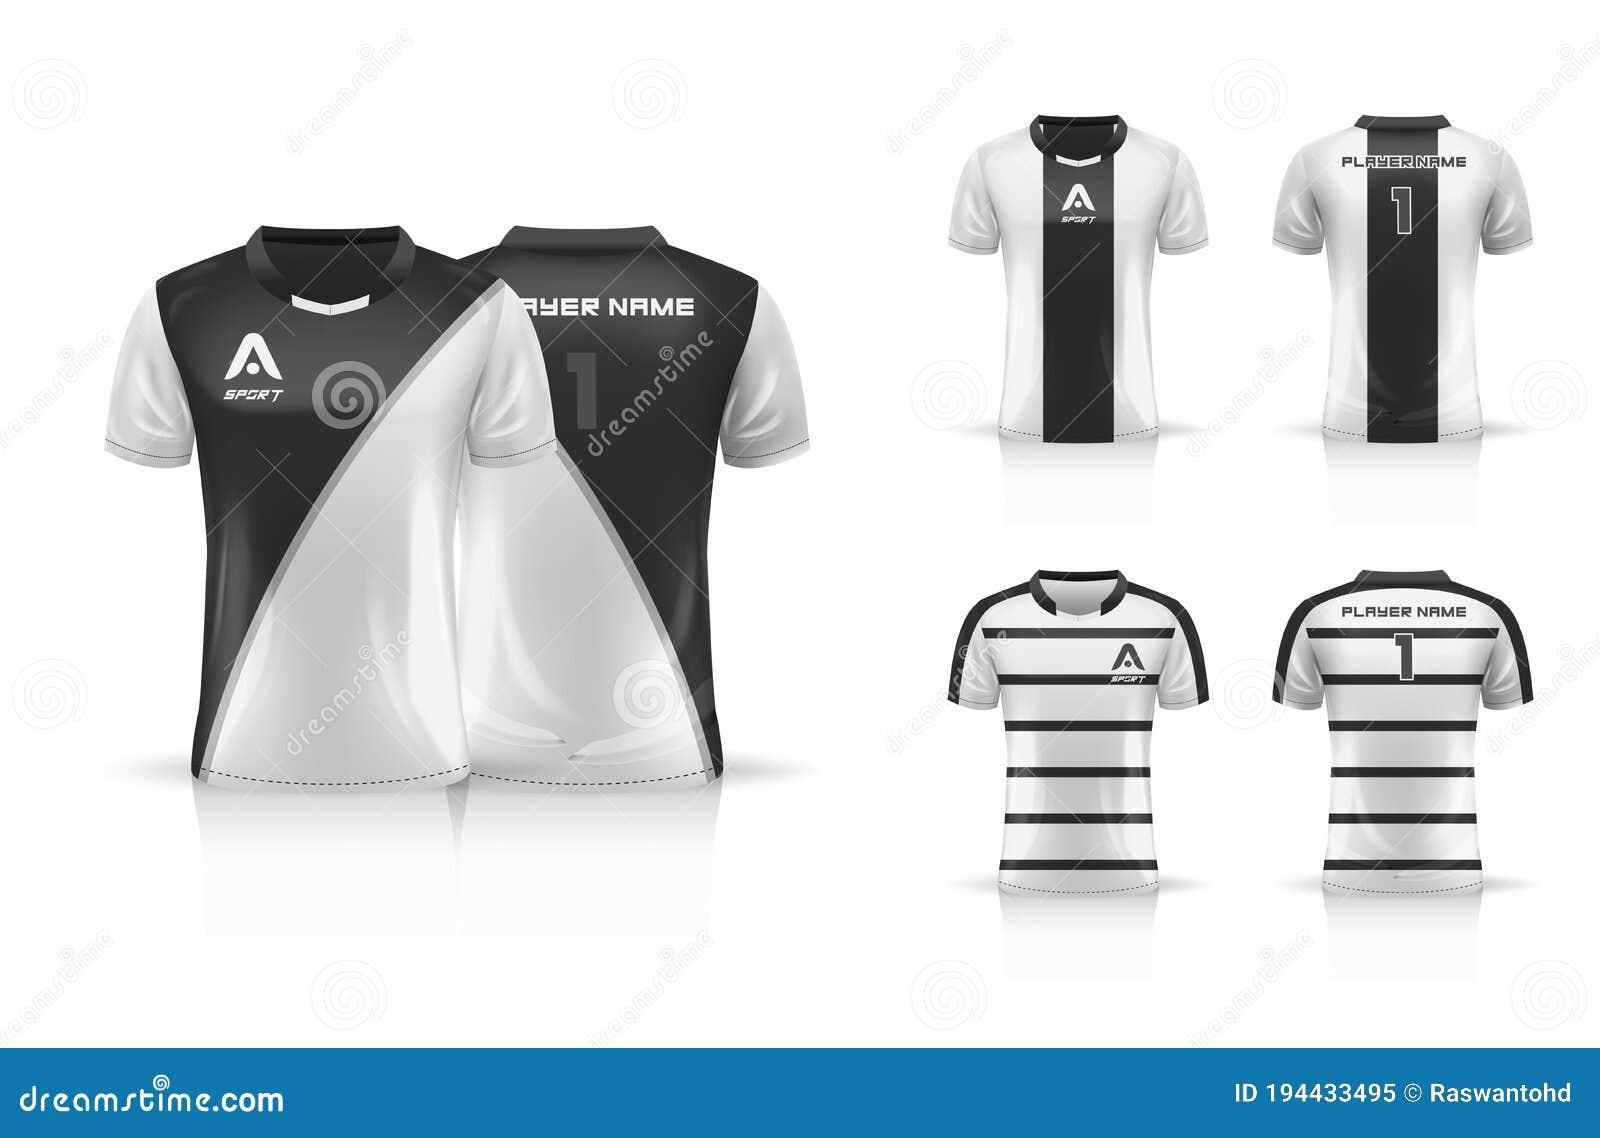 Specification Soccer Sport Esport Gaming T Shirt Jersey Template Mock Up Uniform Collection Set Vector Illustration Design Stock Vector Illustration Of Apparel Casual 194433495